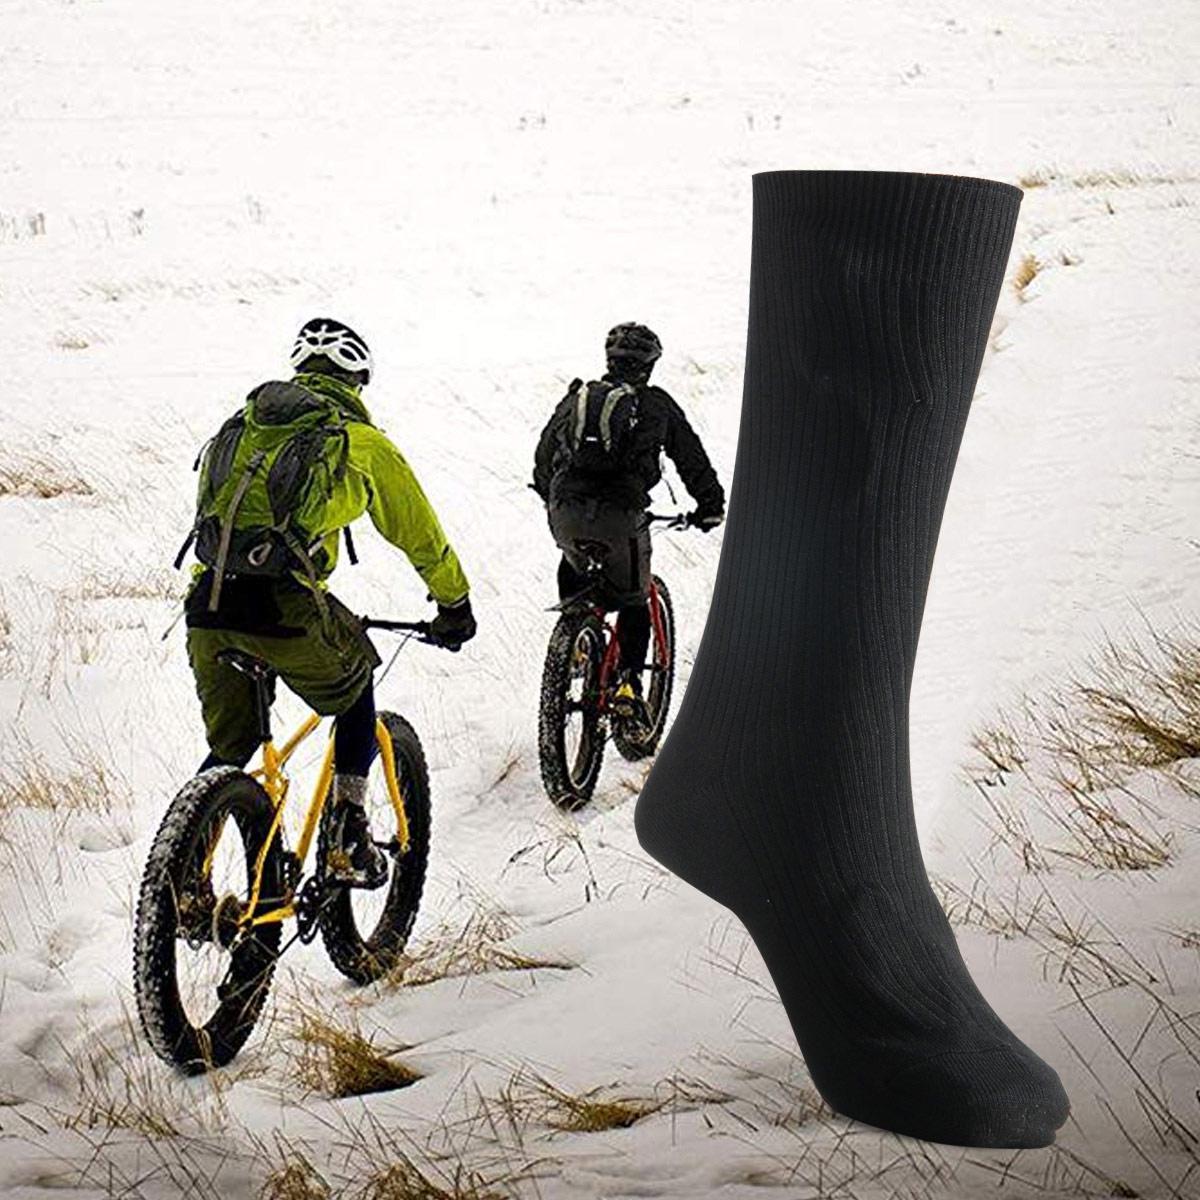 Warmski Unisex Thermal Cotton Heated Socks 6